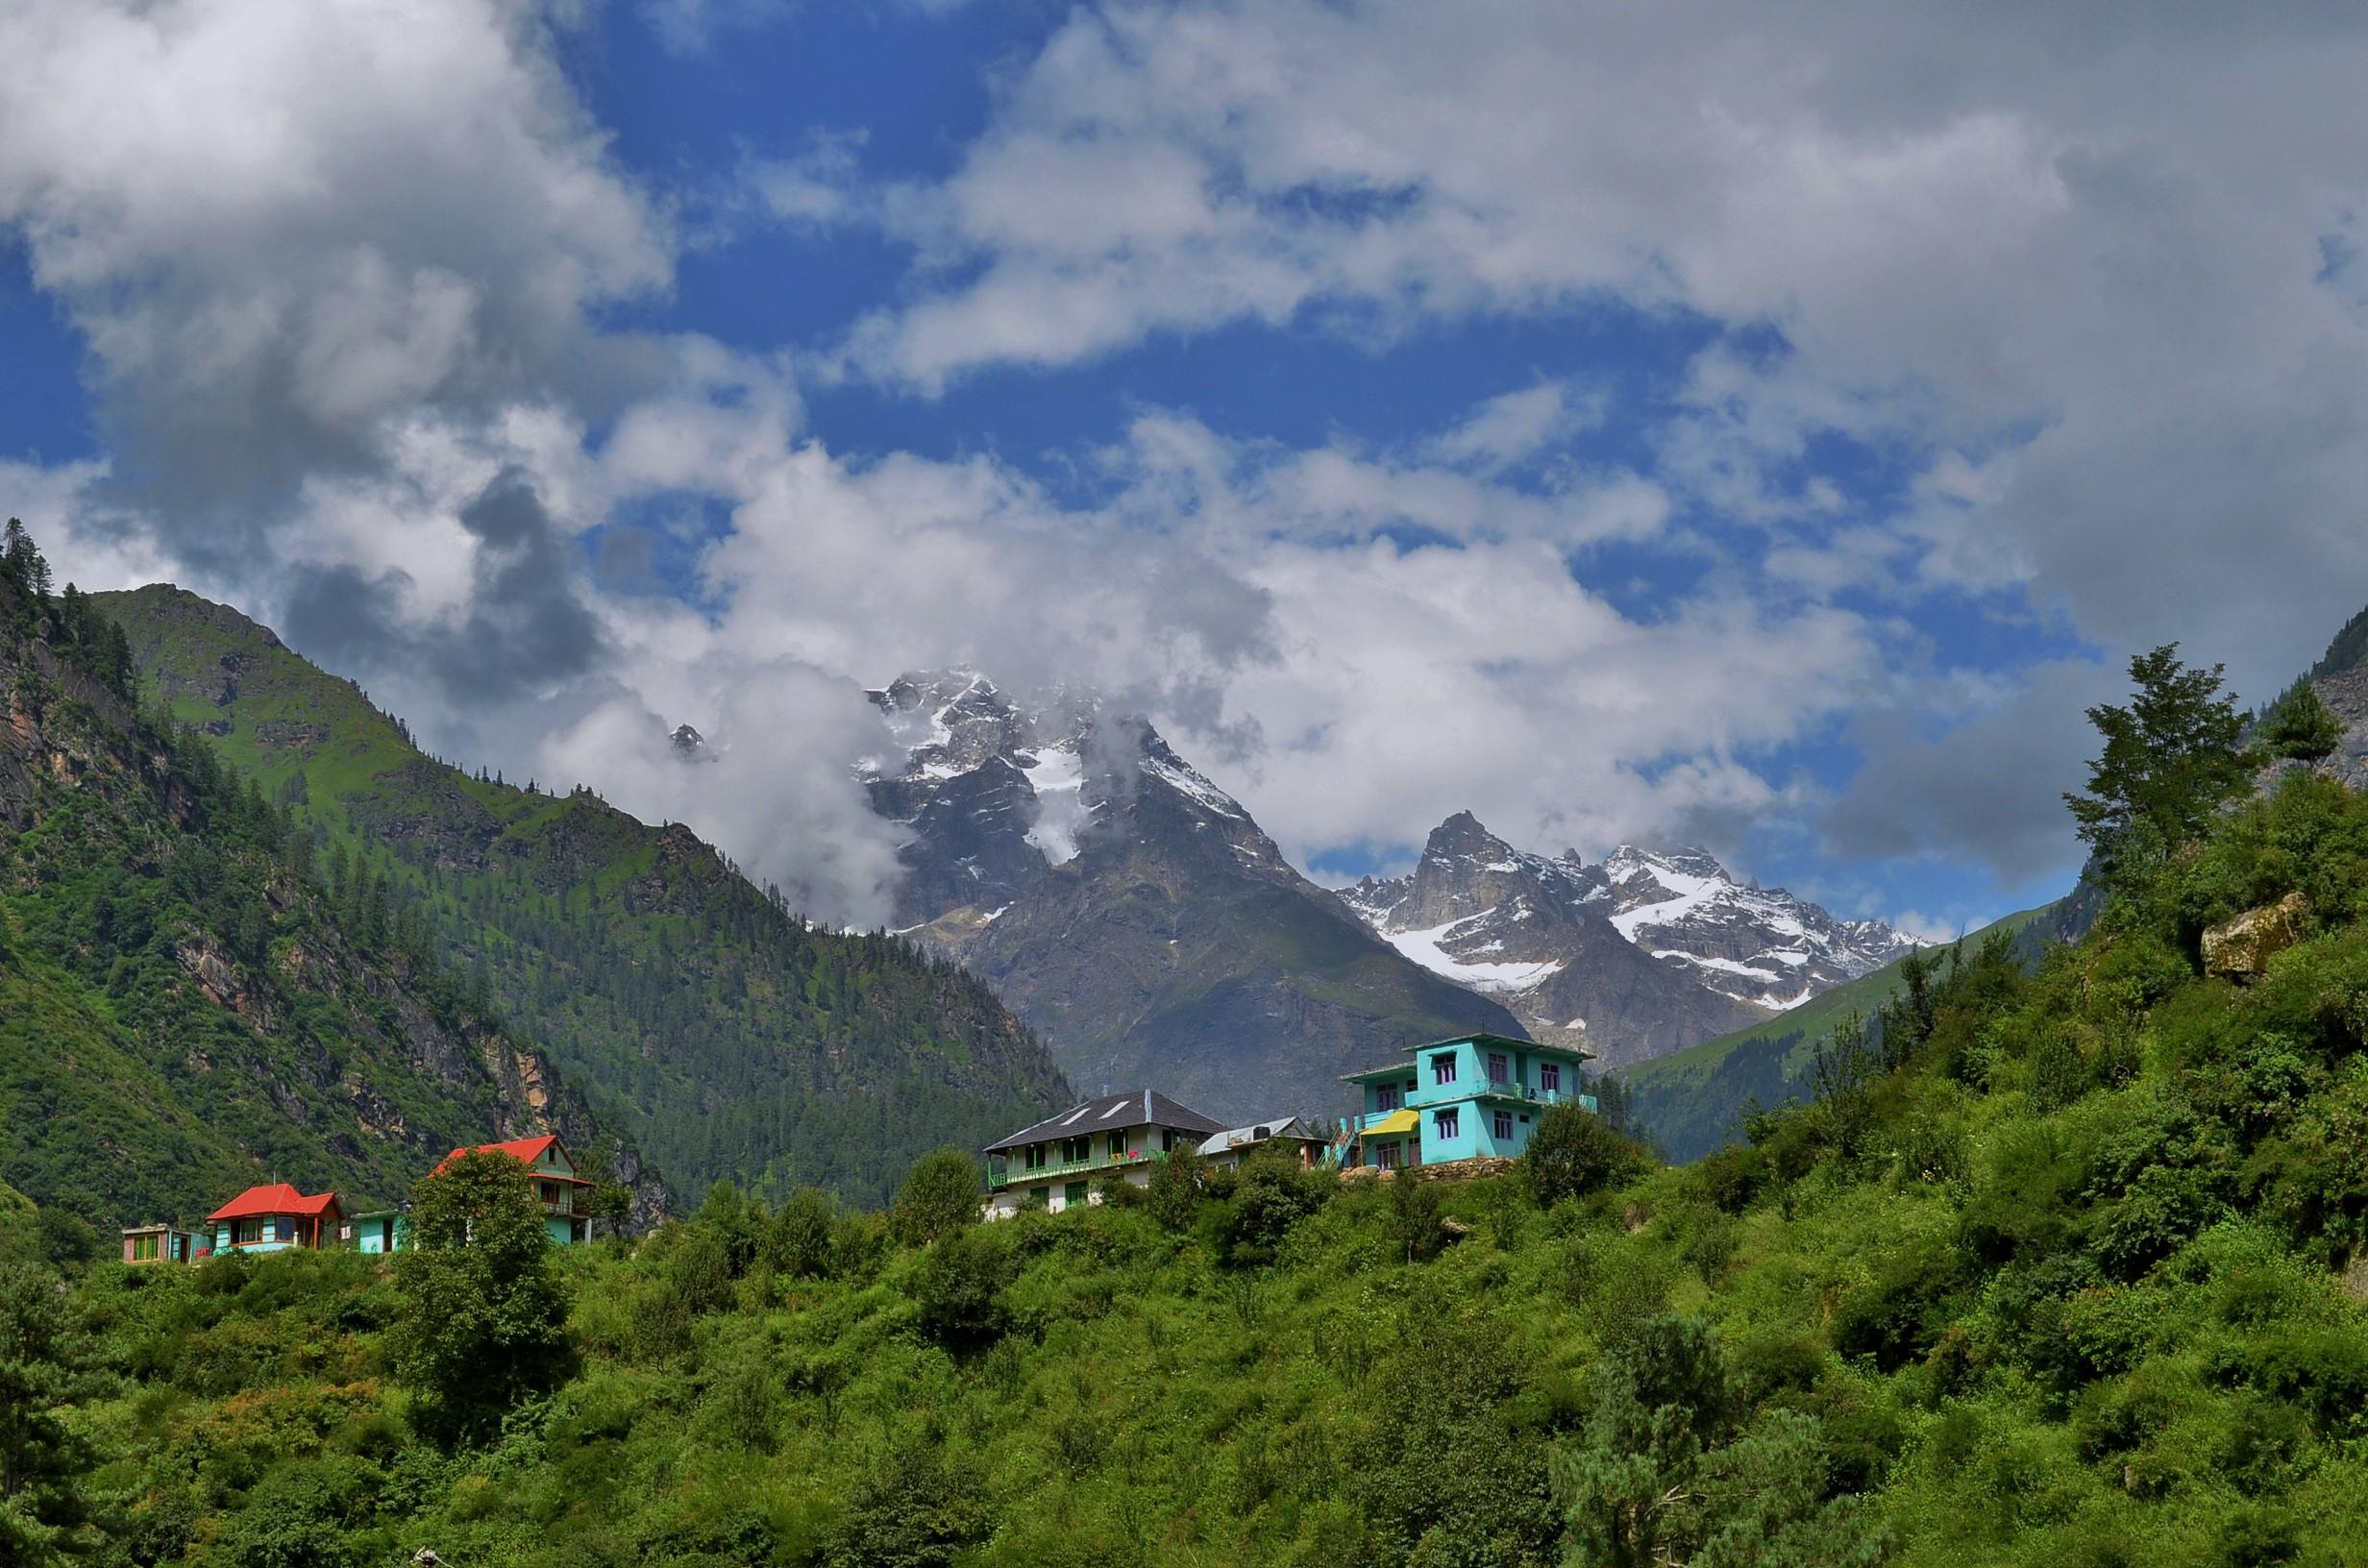 tosh valley from chandigarh